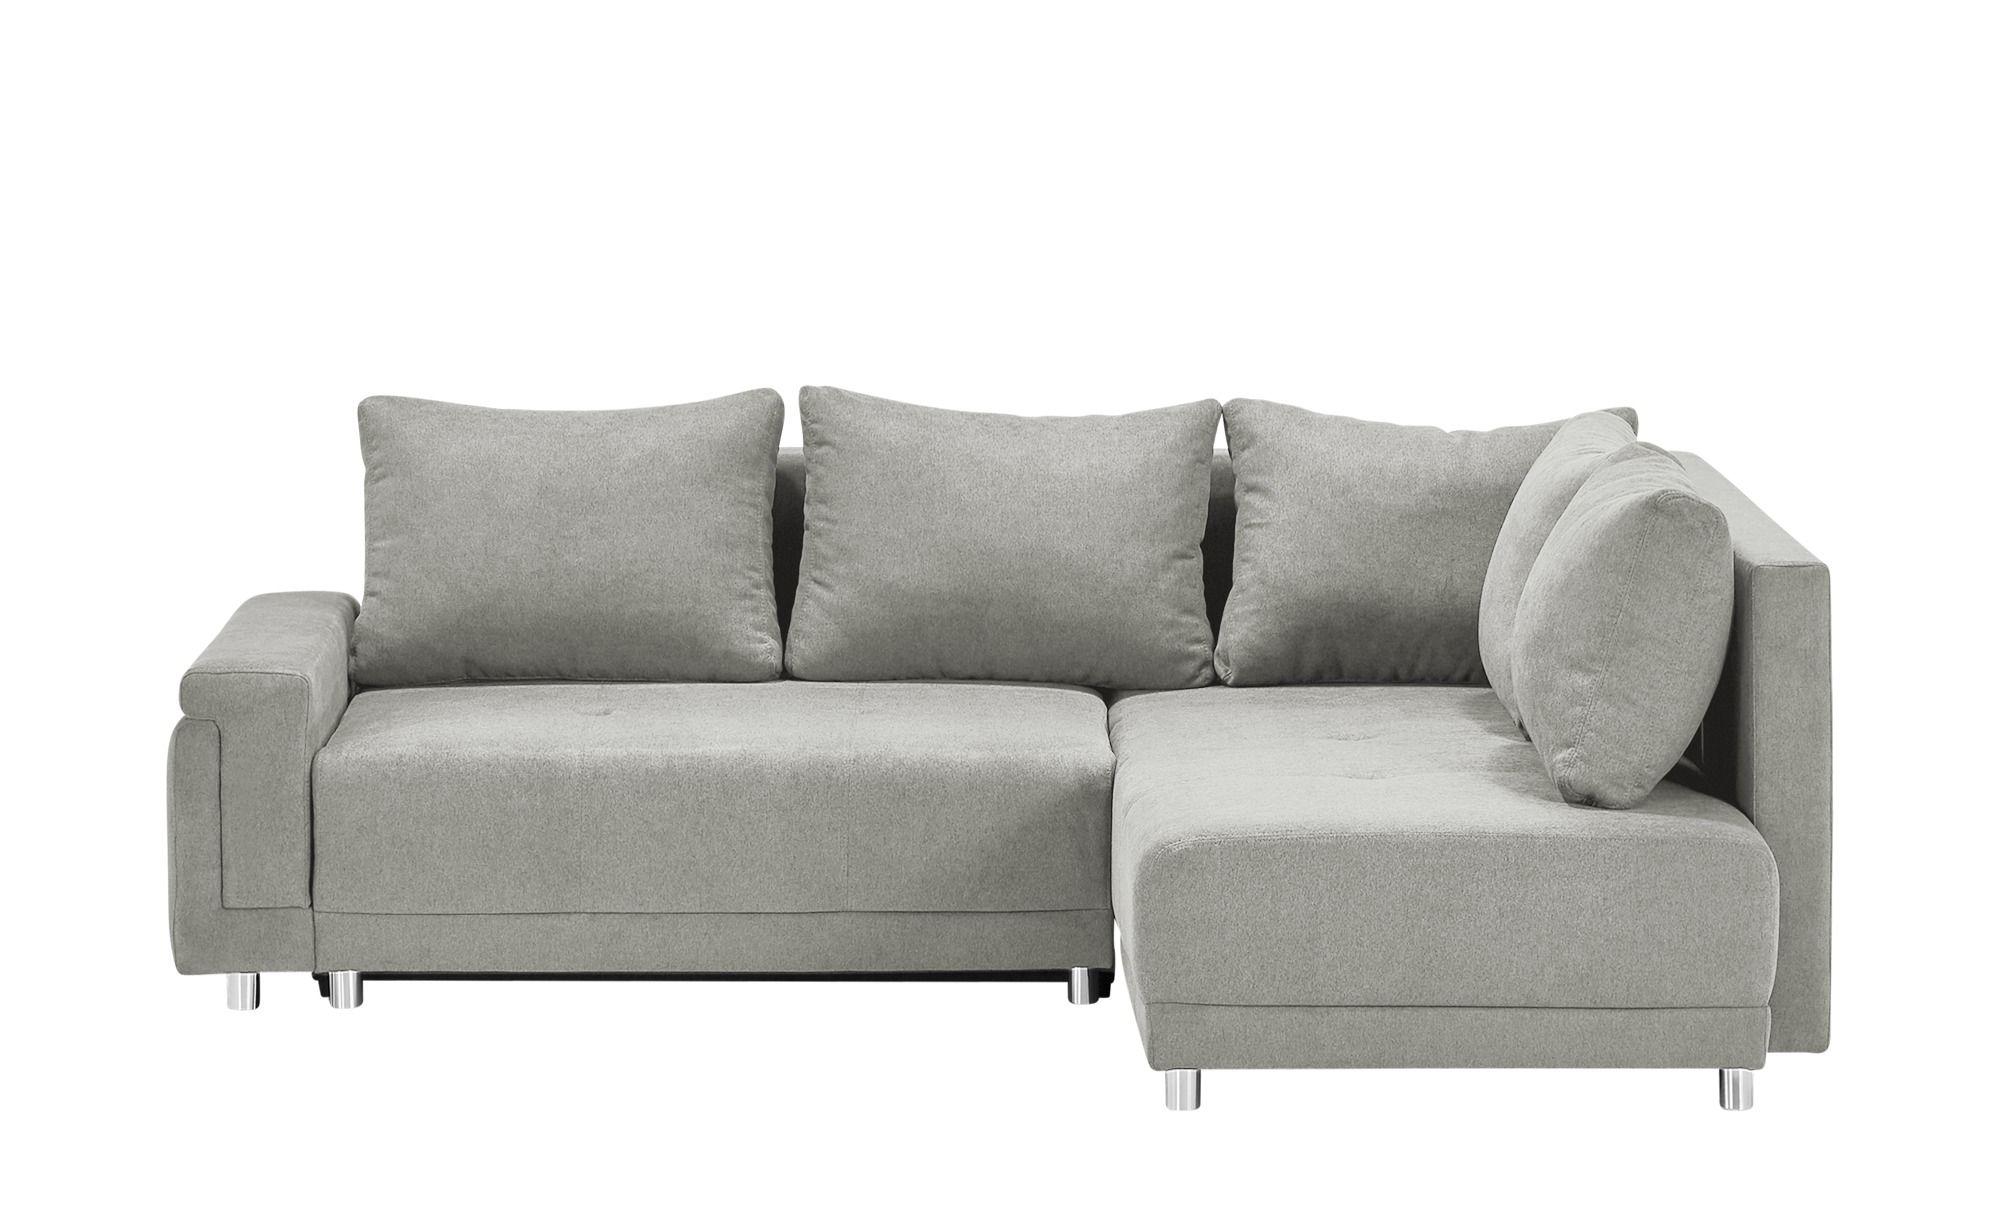 2 Sitzer Sofa Mit Recamiere Designer Schlafsofa Sofa Designs For Living Room With Price Schlafsofa Leder Schwarz Kaufen Ledersofa Bill